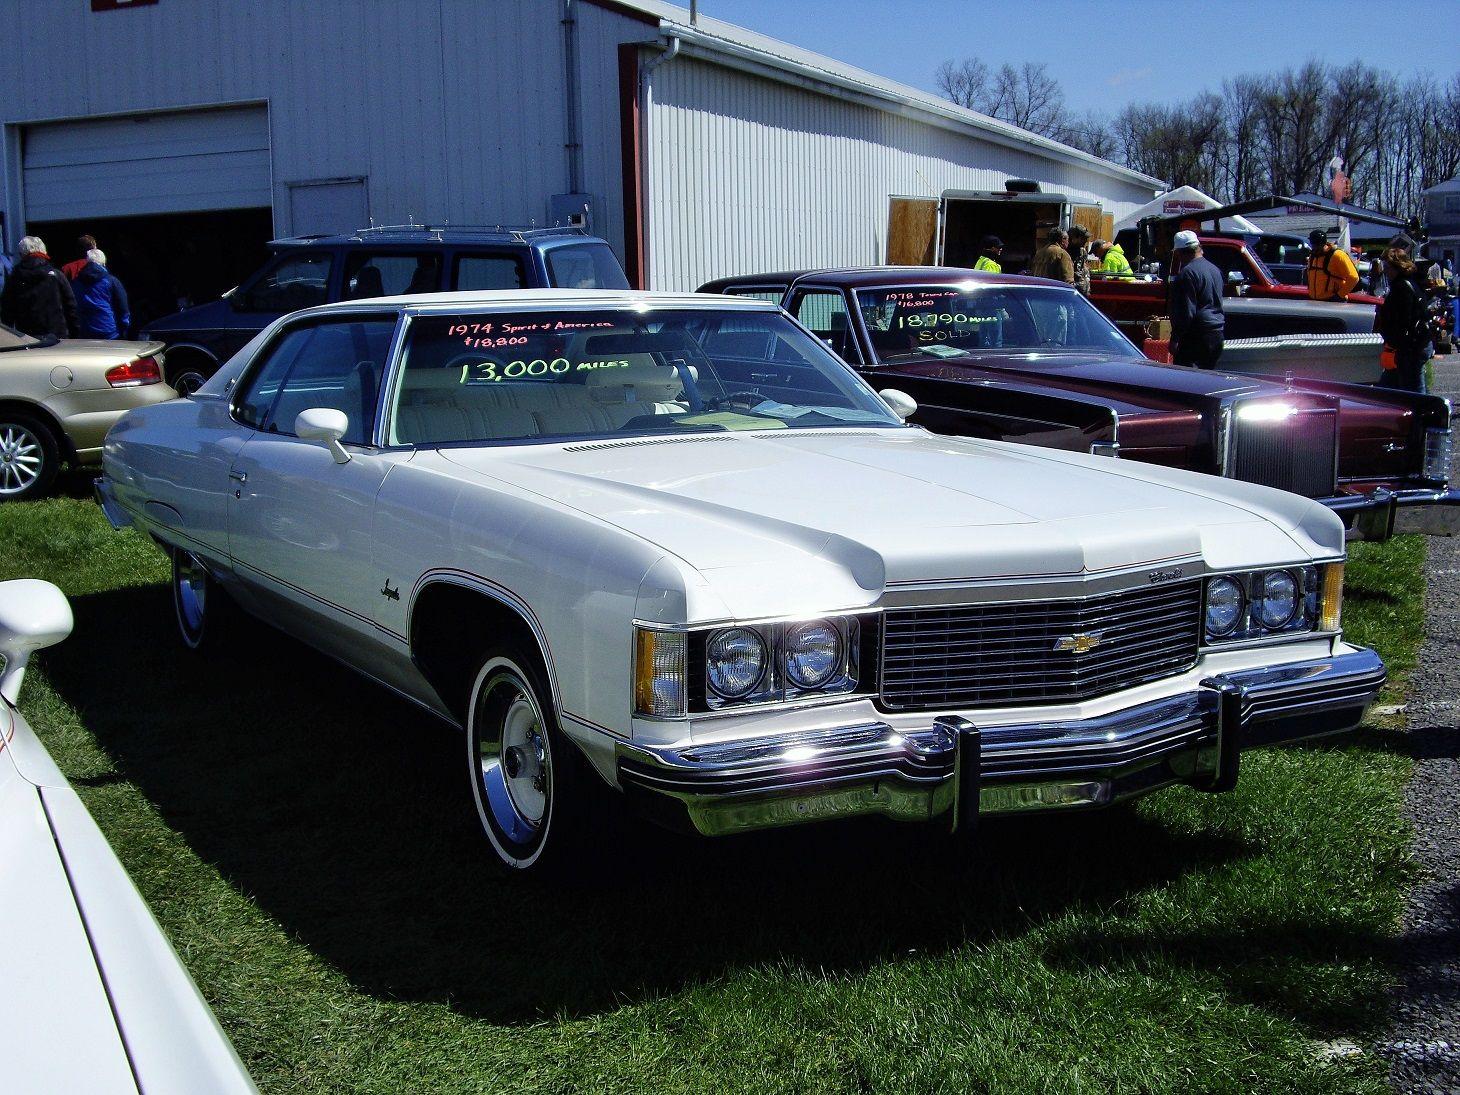 1974 spirit of america chevrolet impala sport coupe  [ 1460 x 1095 Pixel ]